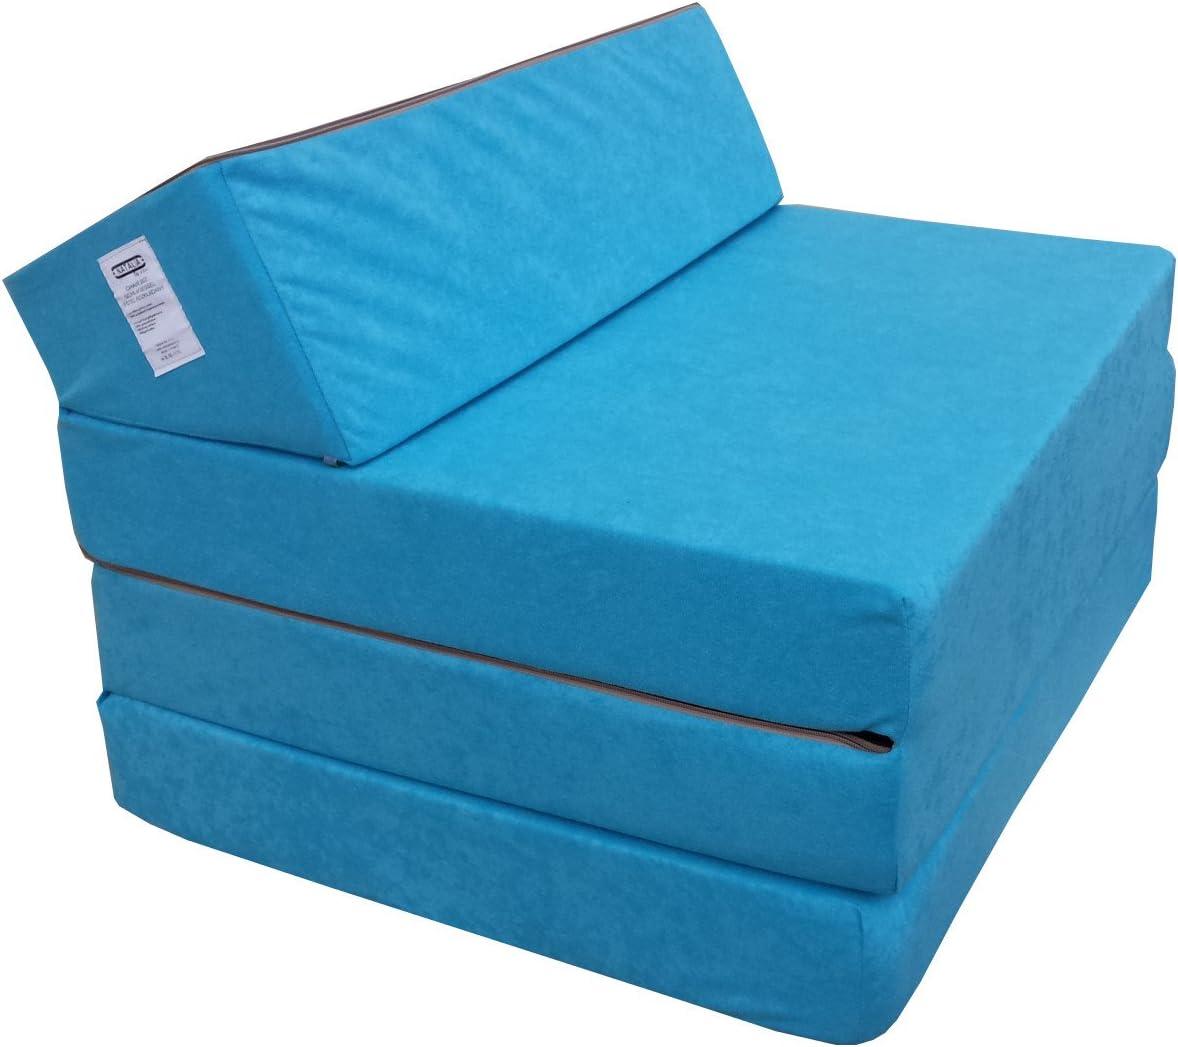 Natalia Spzoo Colchón Plegable Cama de Invitados colchón de Espuma 200x70 cm FM (Azul)